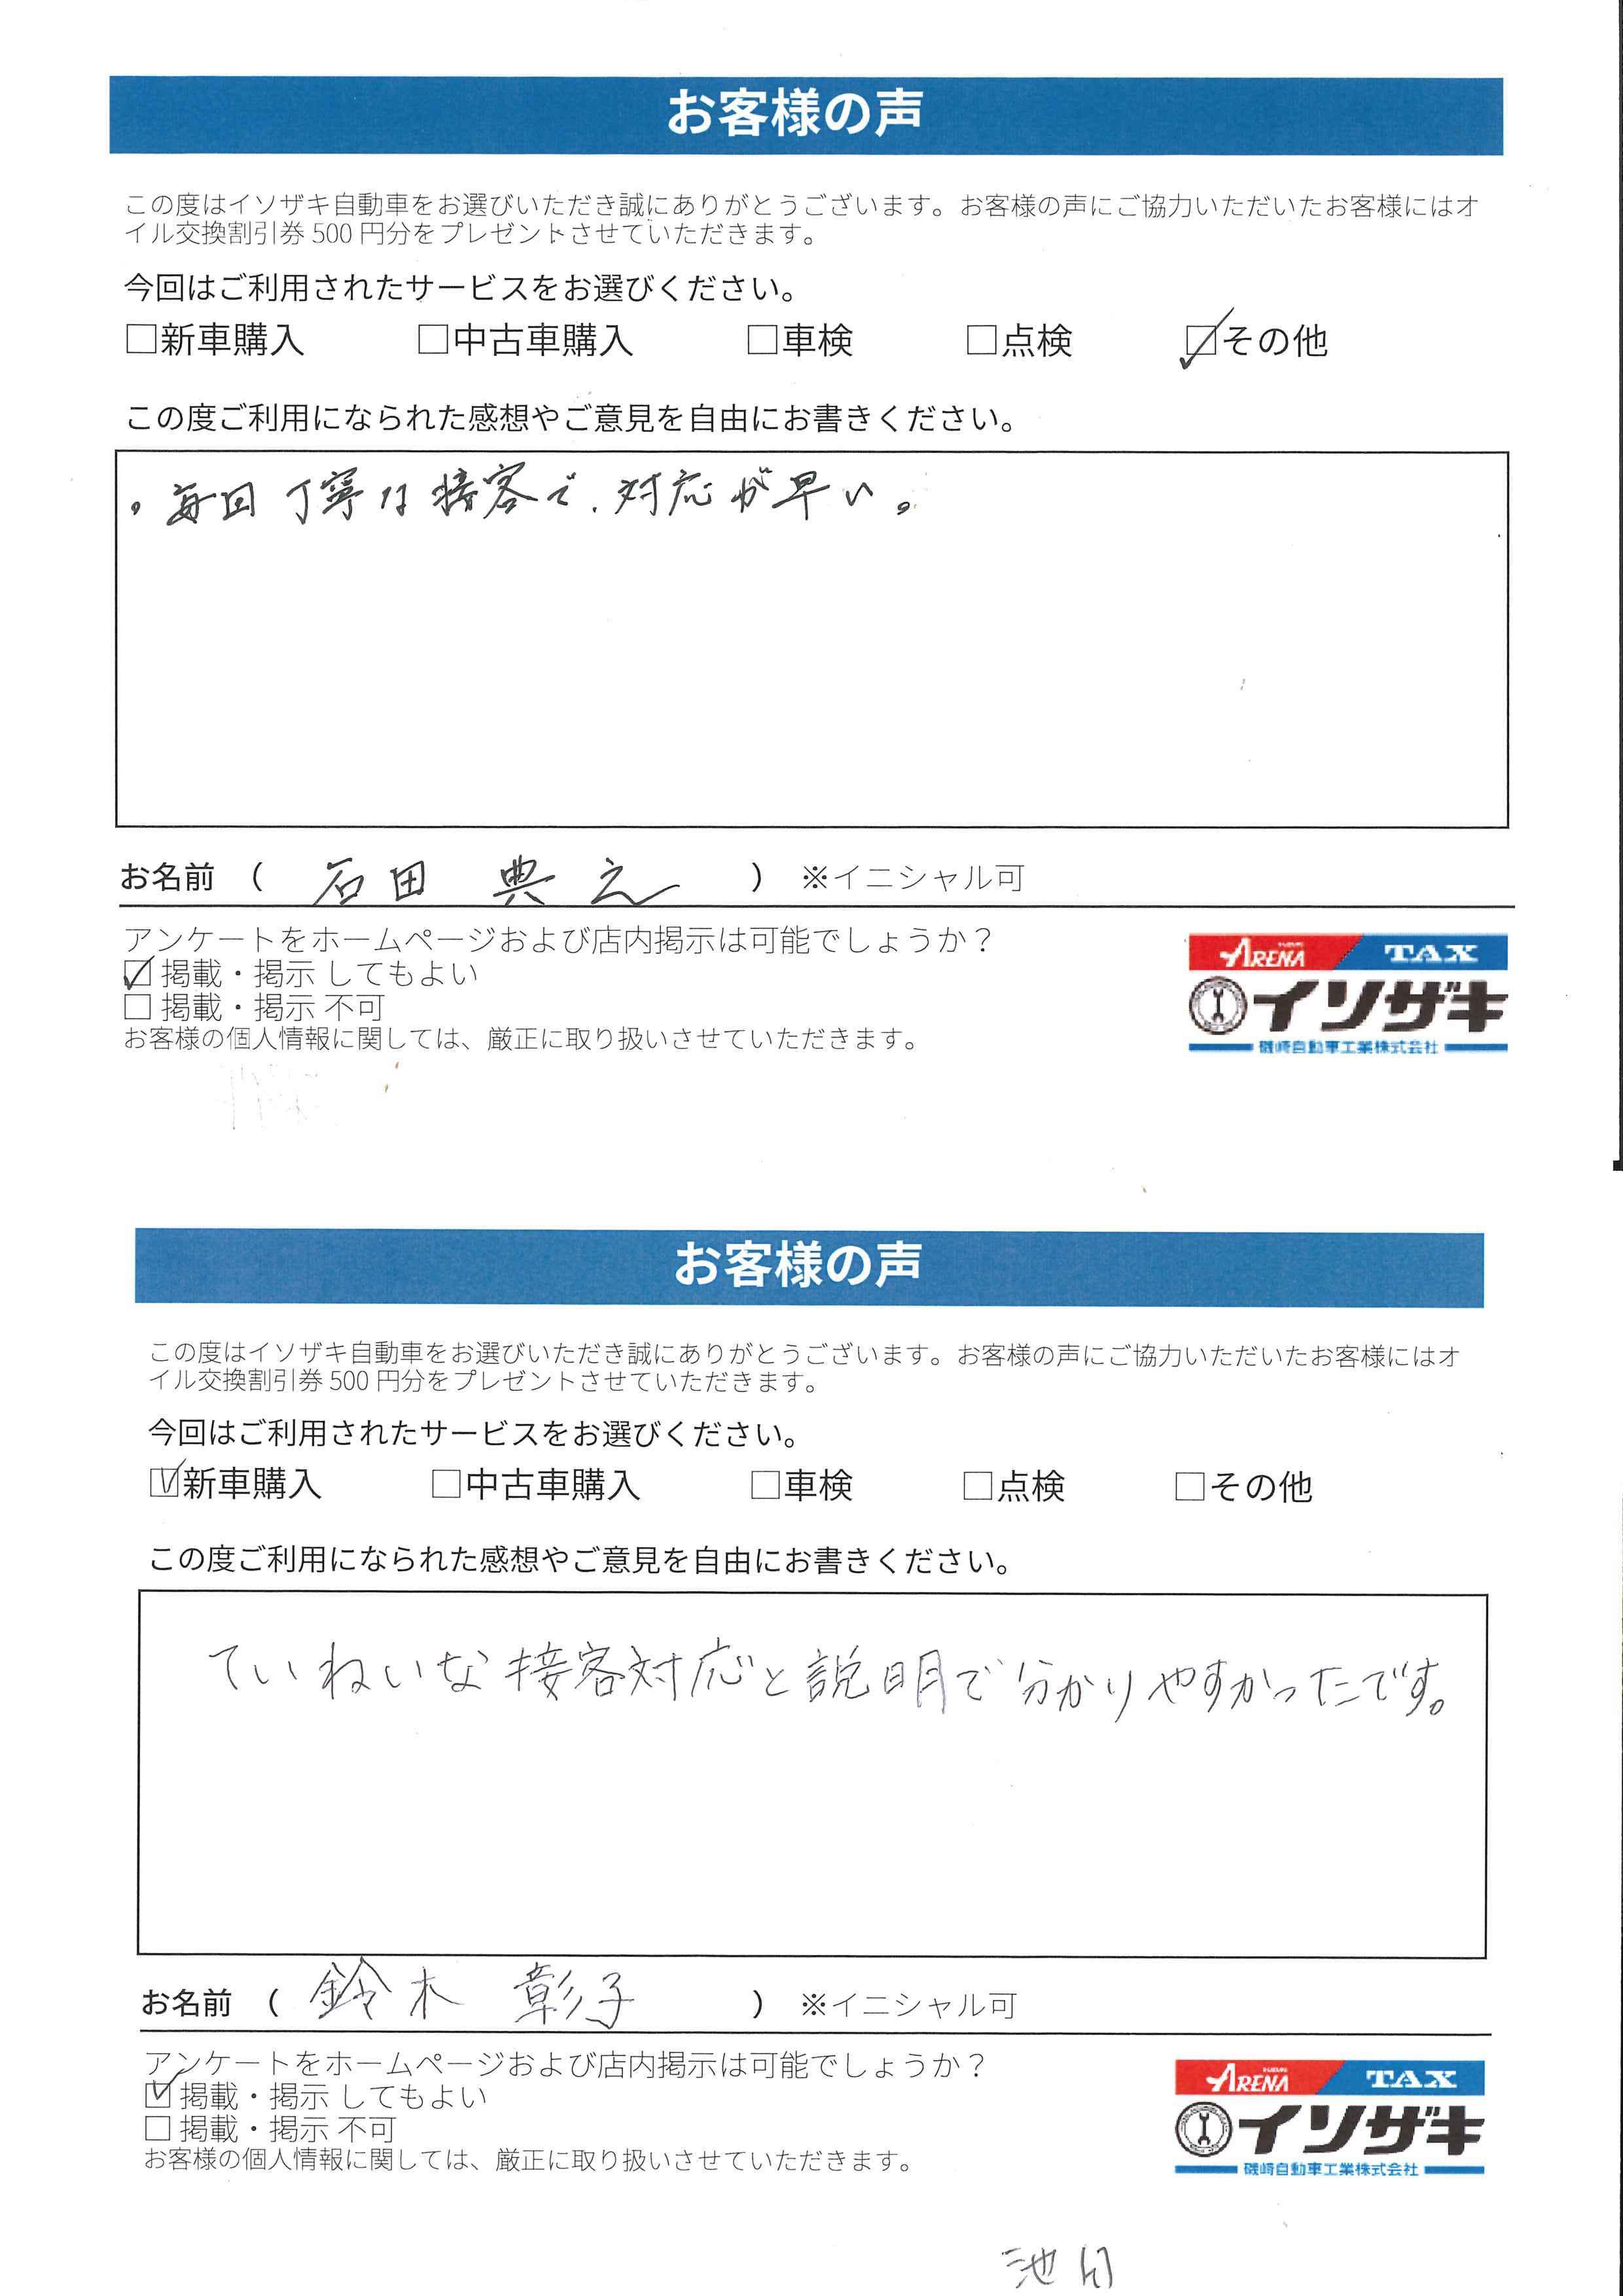 http://tax-isozaki.co.jp/voice/2018.10.11.182156-002%20%E3%81%AE%E3%82%B3%E3%83%94%E3%83%BC.jpg